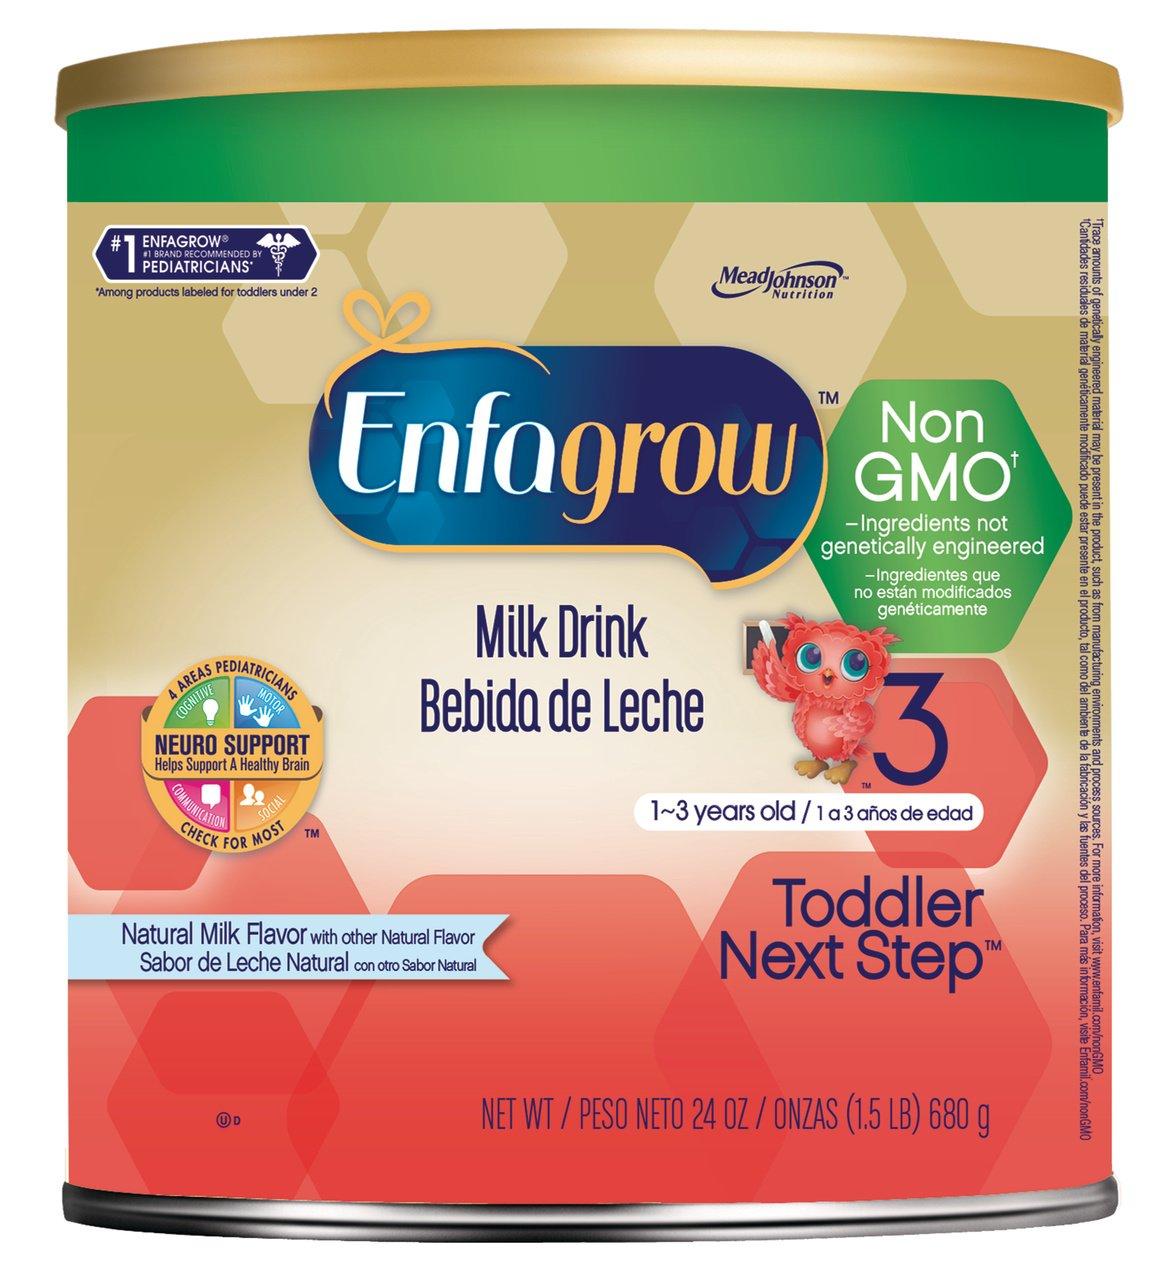 Enfagrow Toddler Natural Milk Non GMO Milk Drink, 24 Ounce (Pack of 4)